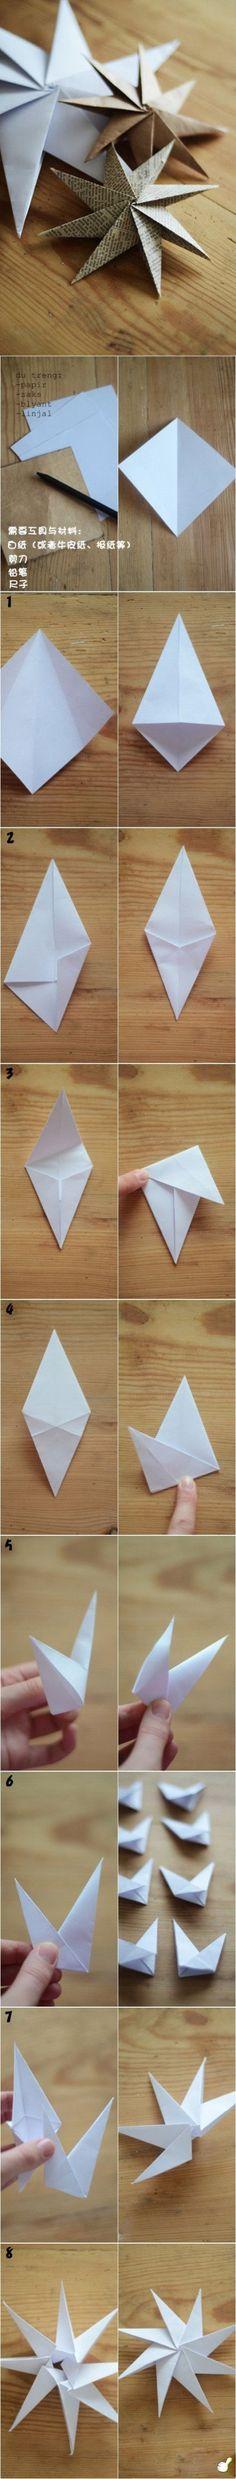 DIY Paper Stars diy craft crafts craft ideas easy crafts diy ideas diy crafts easy diy kids crafts paper crafts kids craft